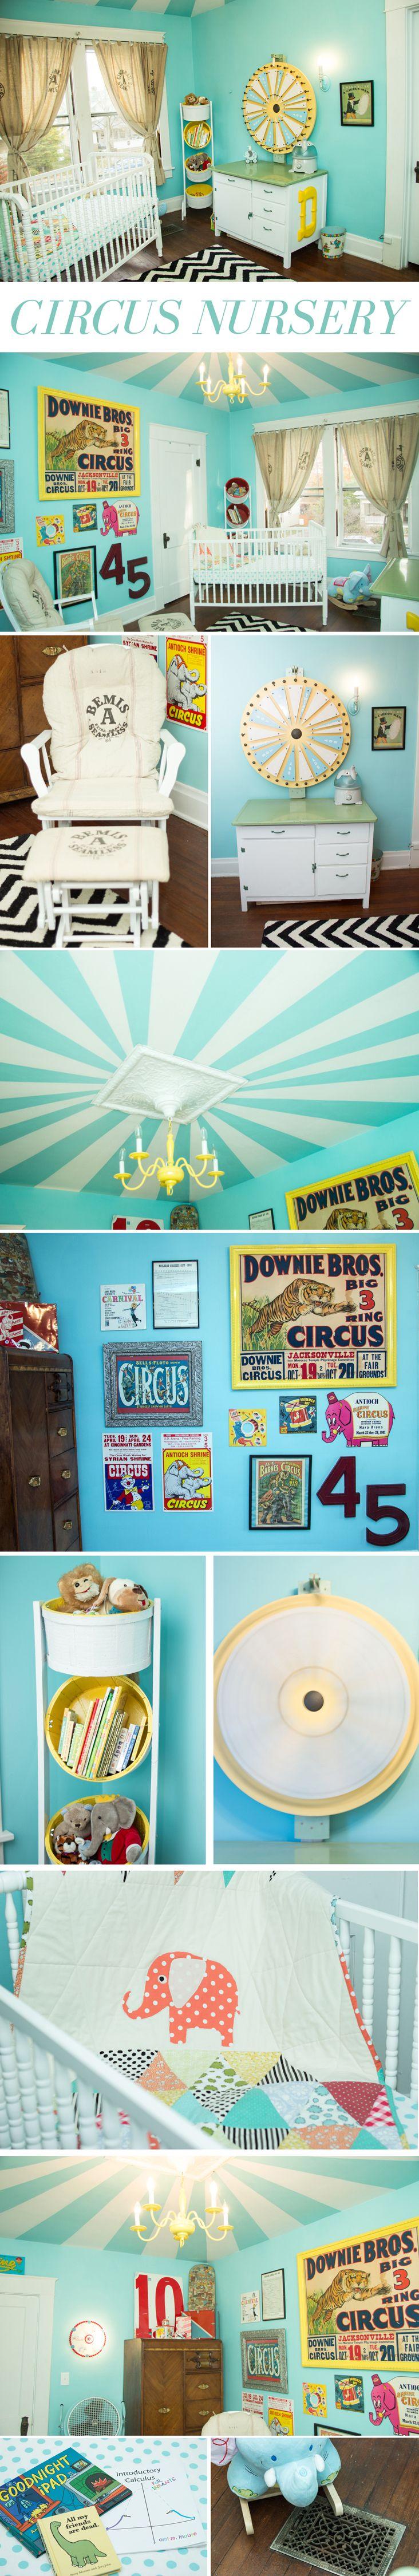 Vintage circus nursery! Ritzy Rosebud.